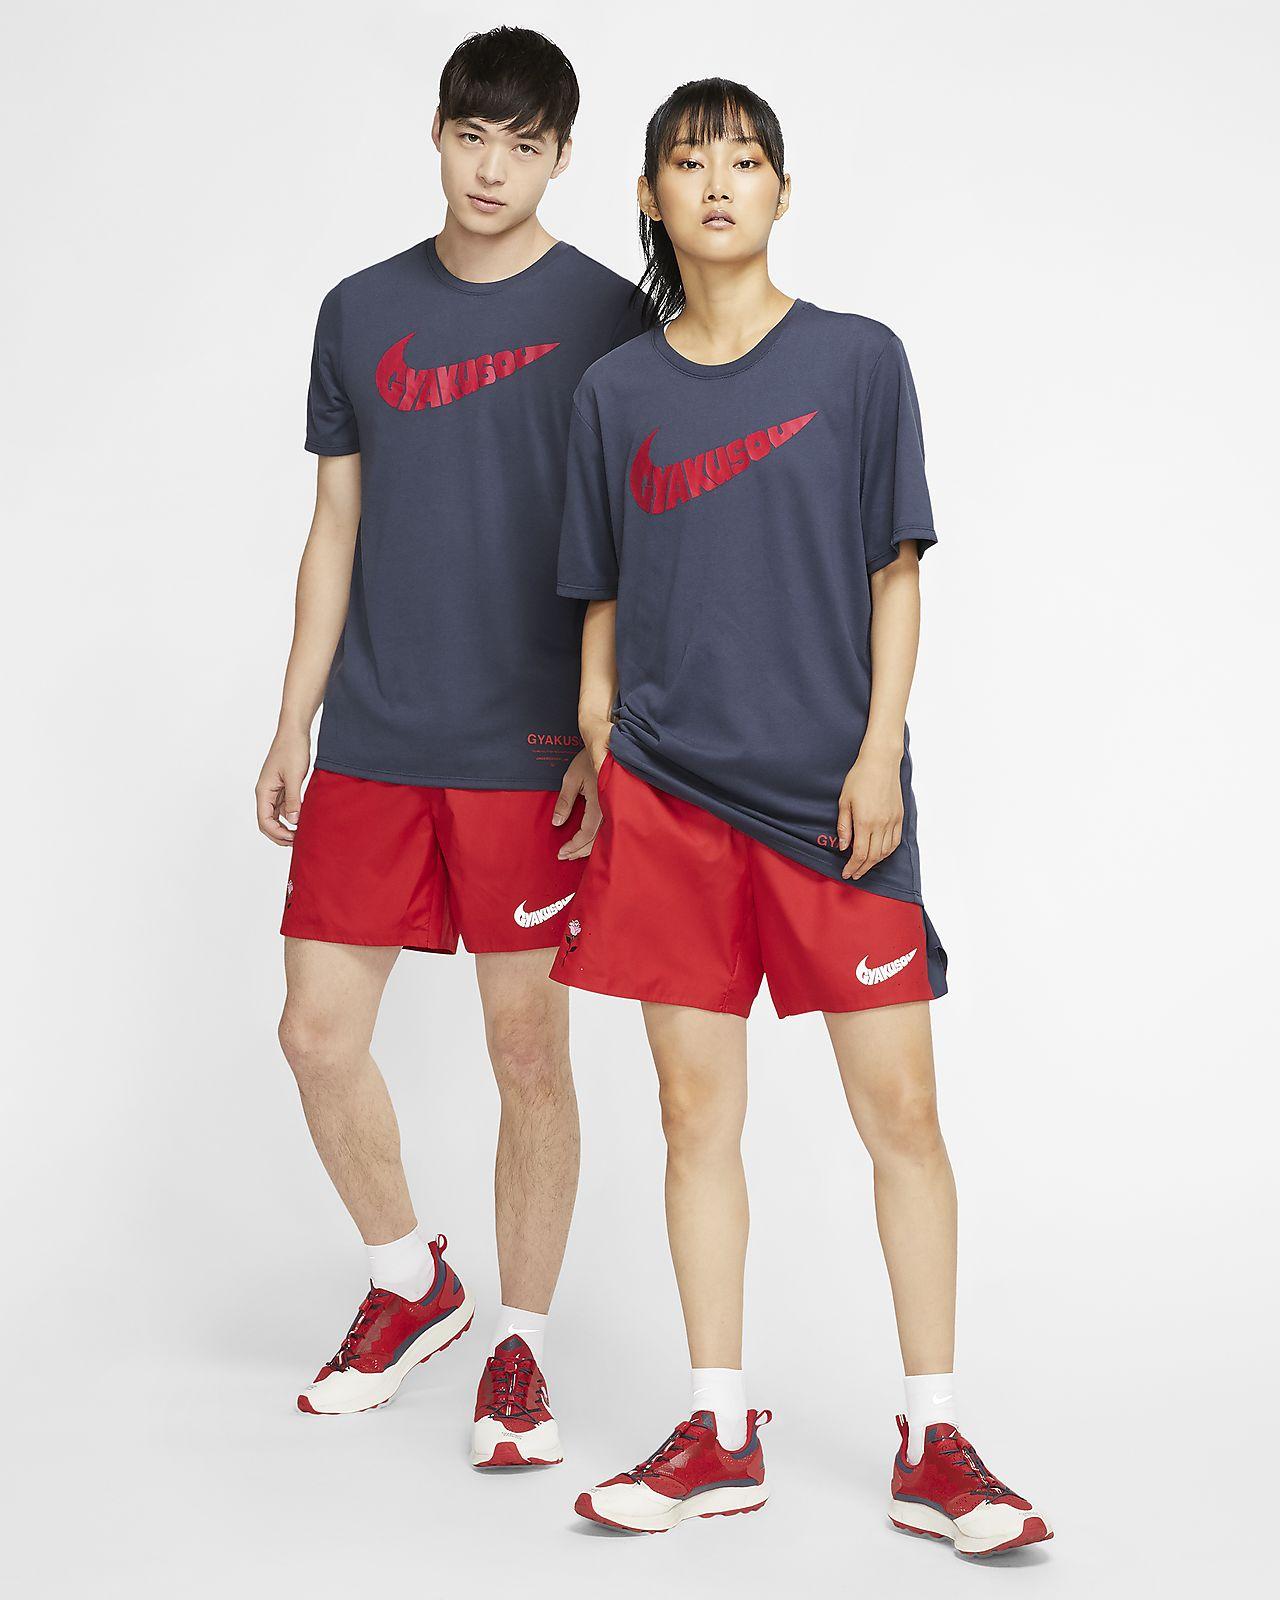 Pantaloncini da jogging Nike, t shirt con logo, felpa con